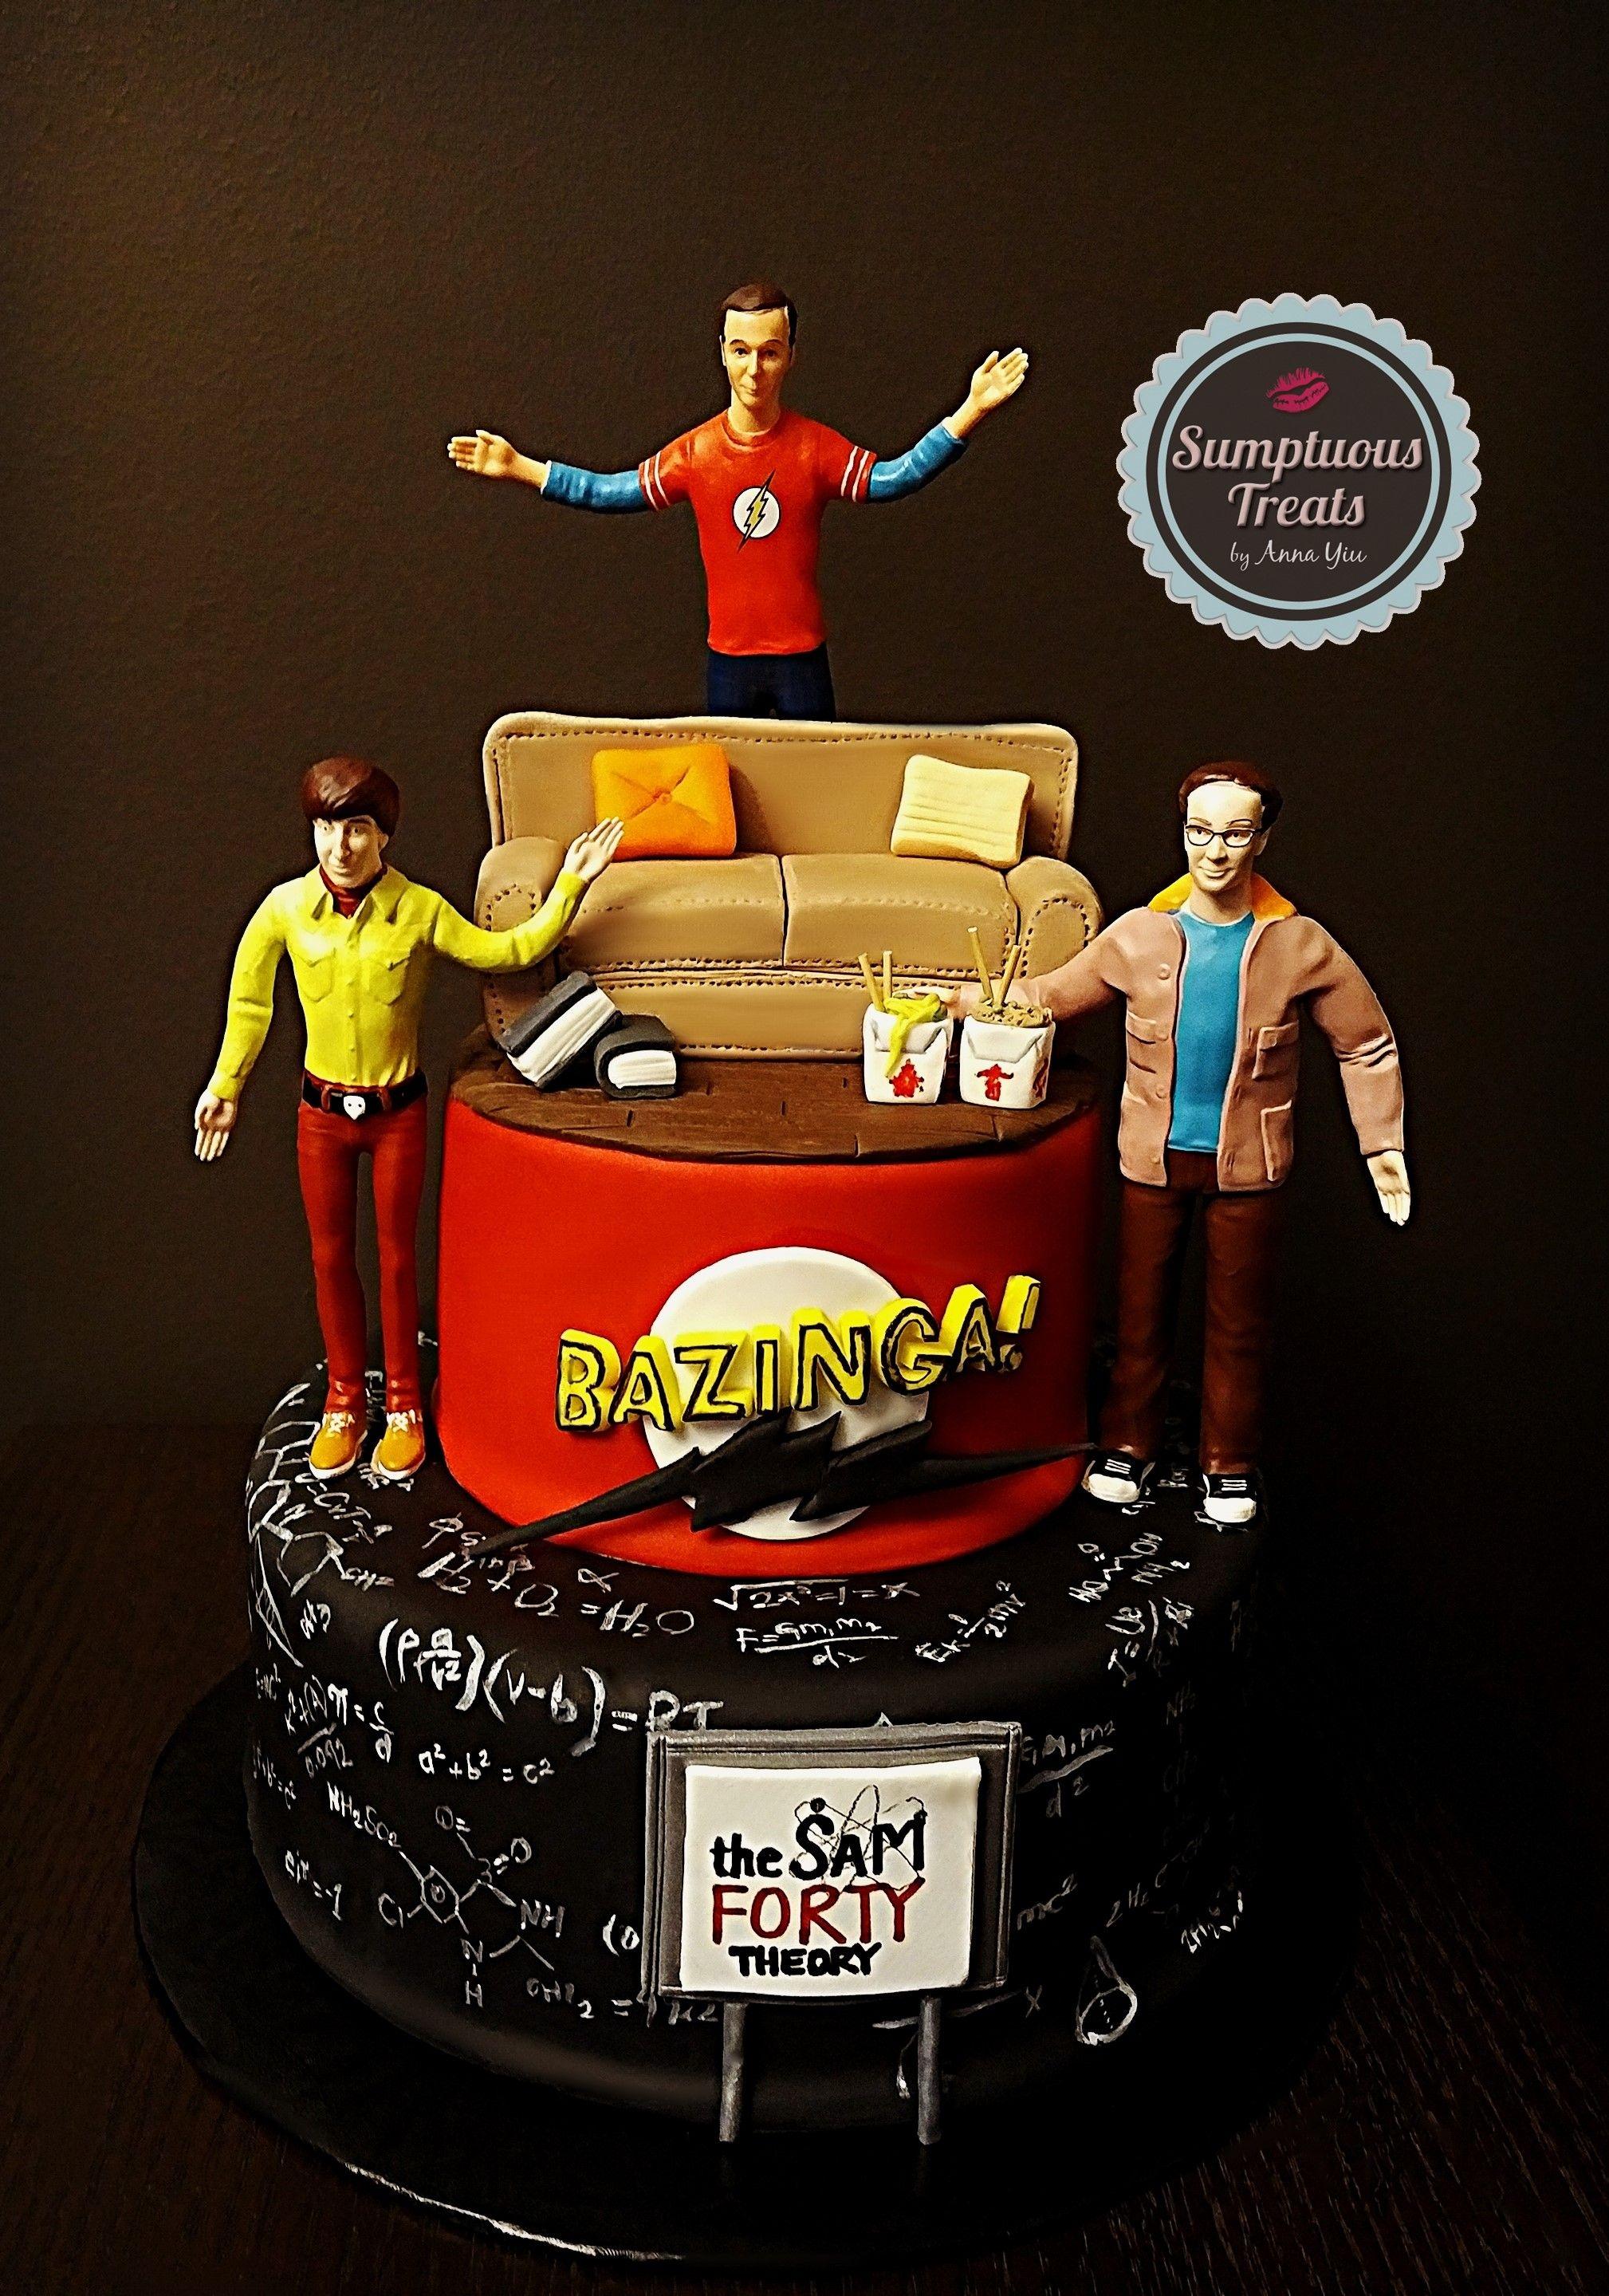 Big Bang Theory Custom Made To Order Cakes Cookies